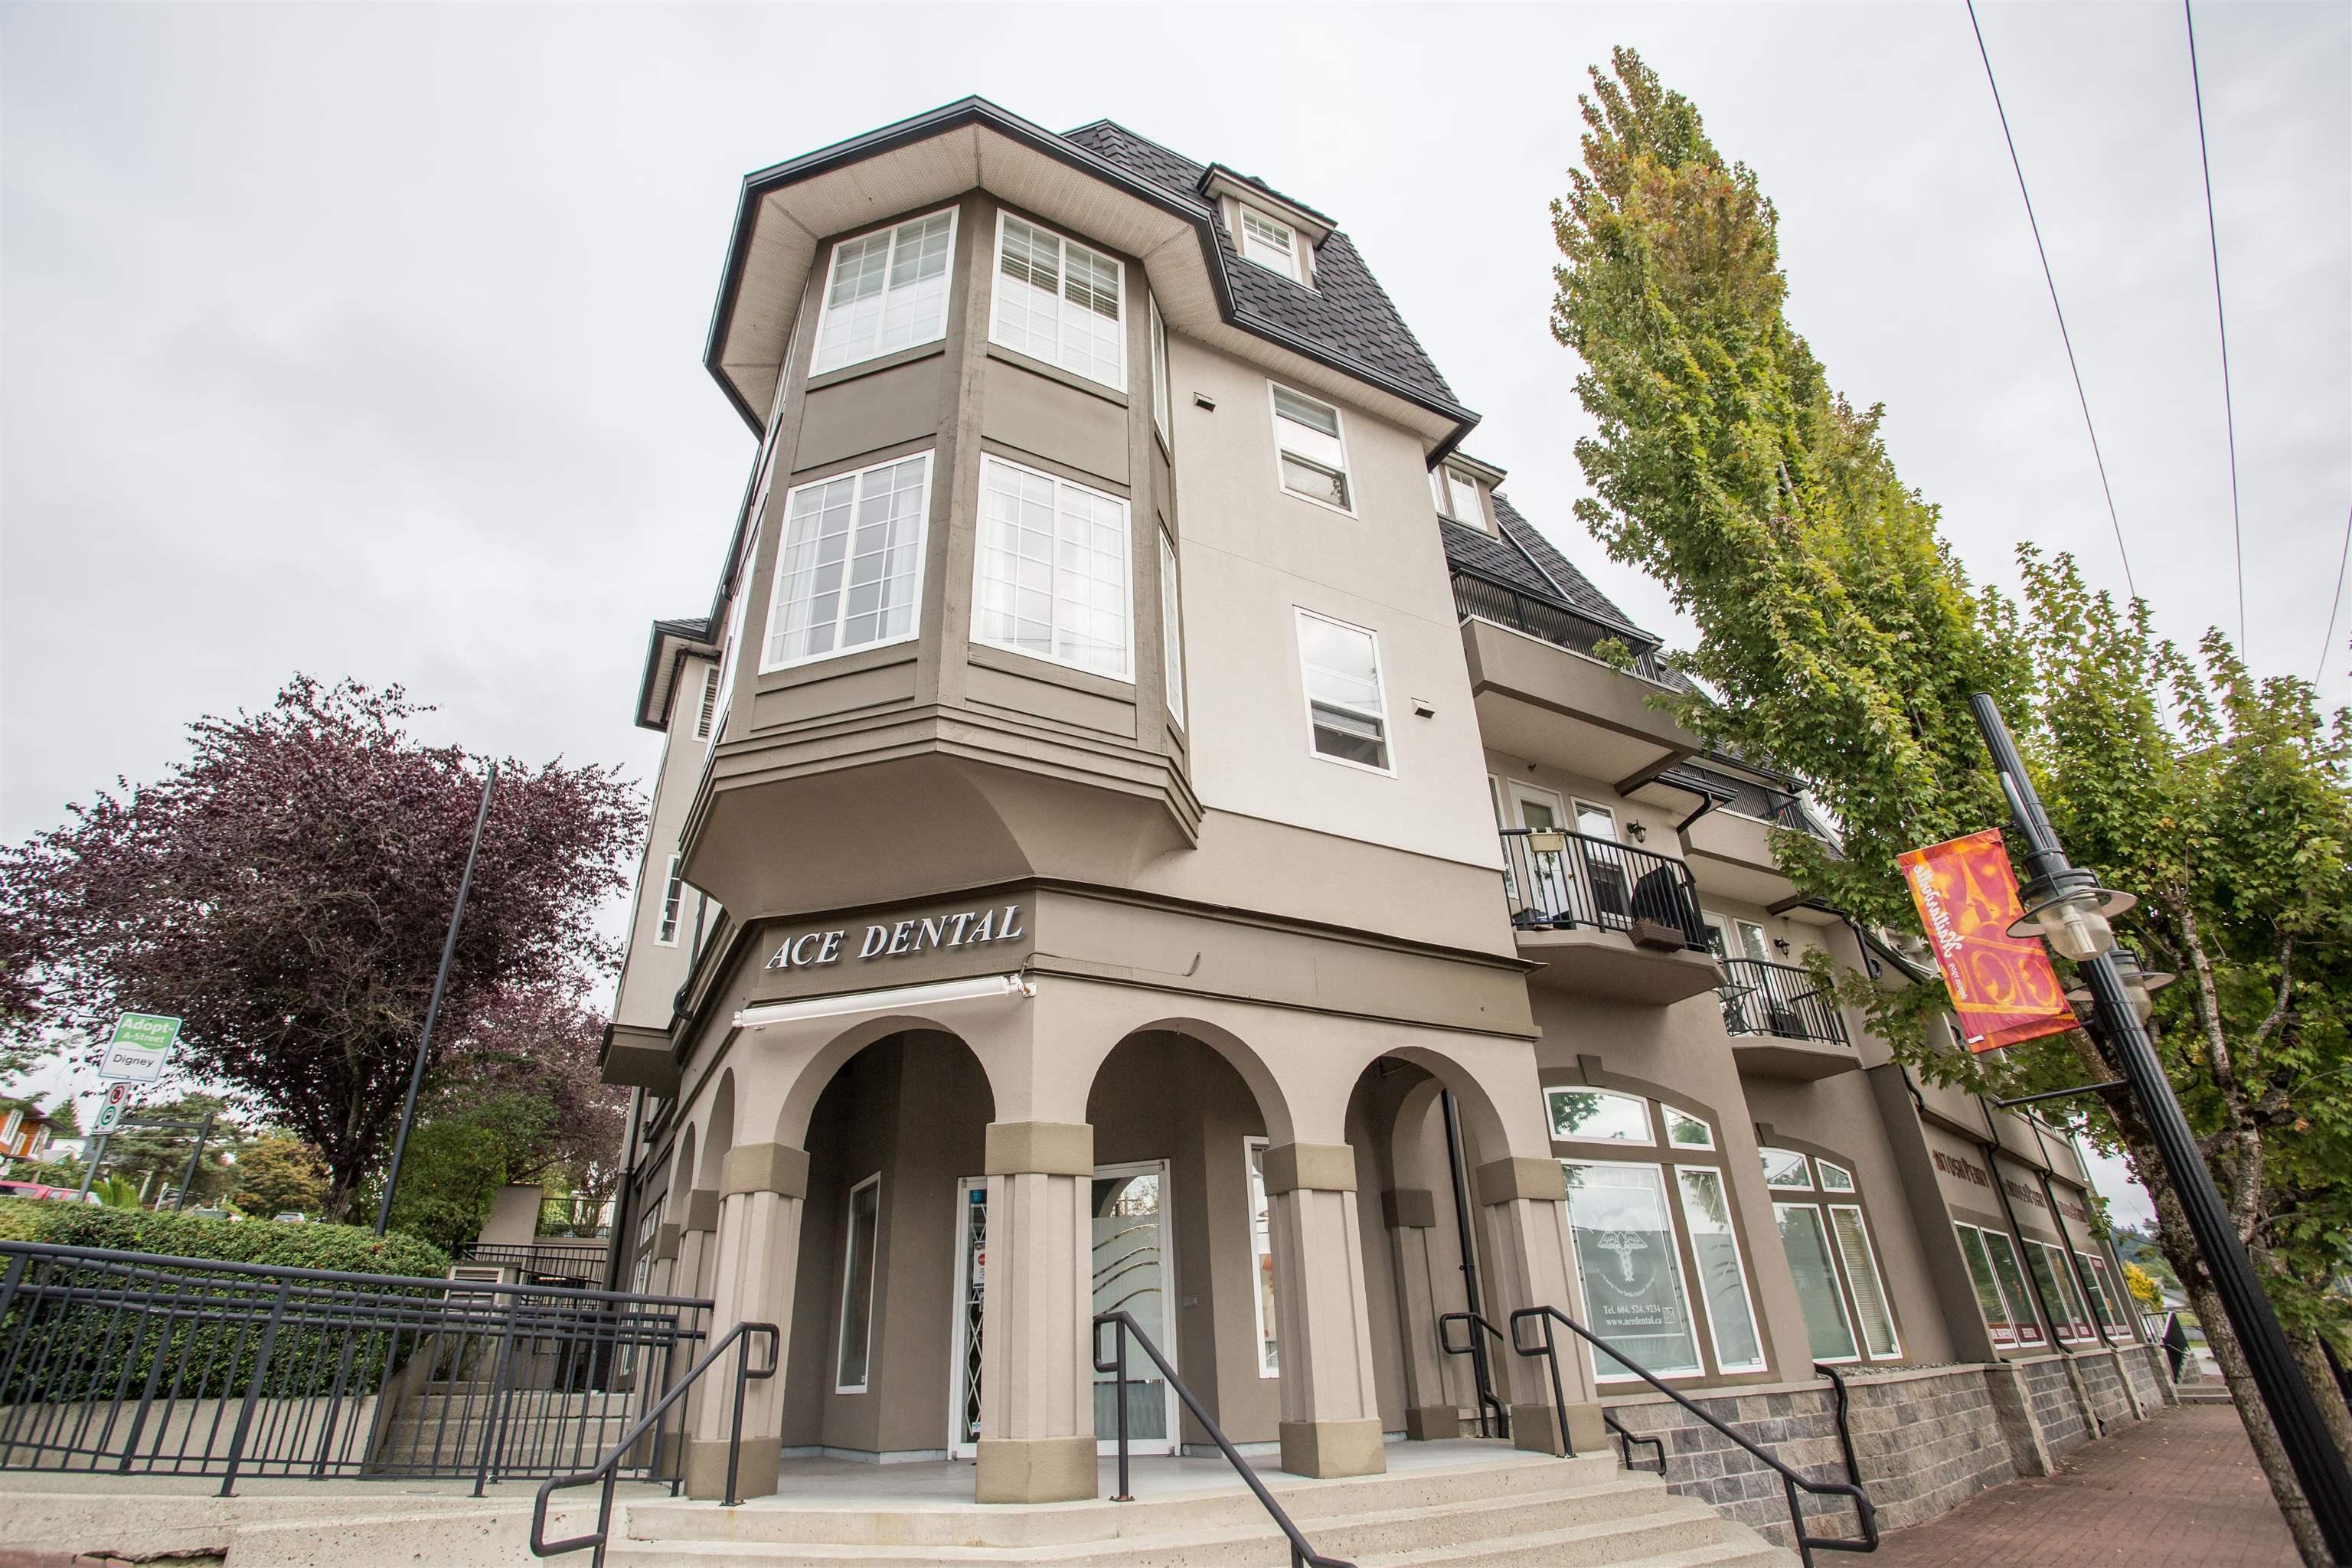 7 205 LEBLEU STREET - Maillardville Apartment/Condo for sale, 3 Bedrooms (R2625671) - #28